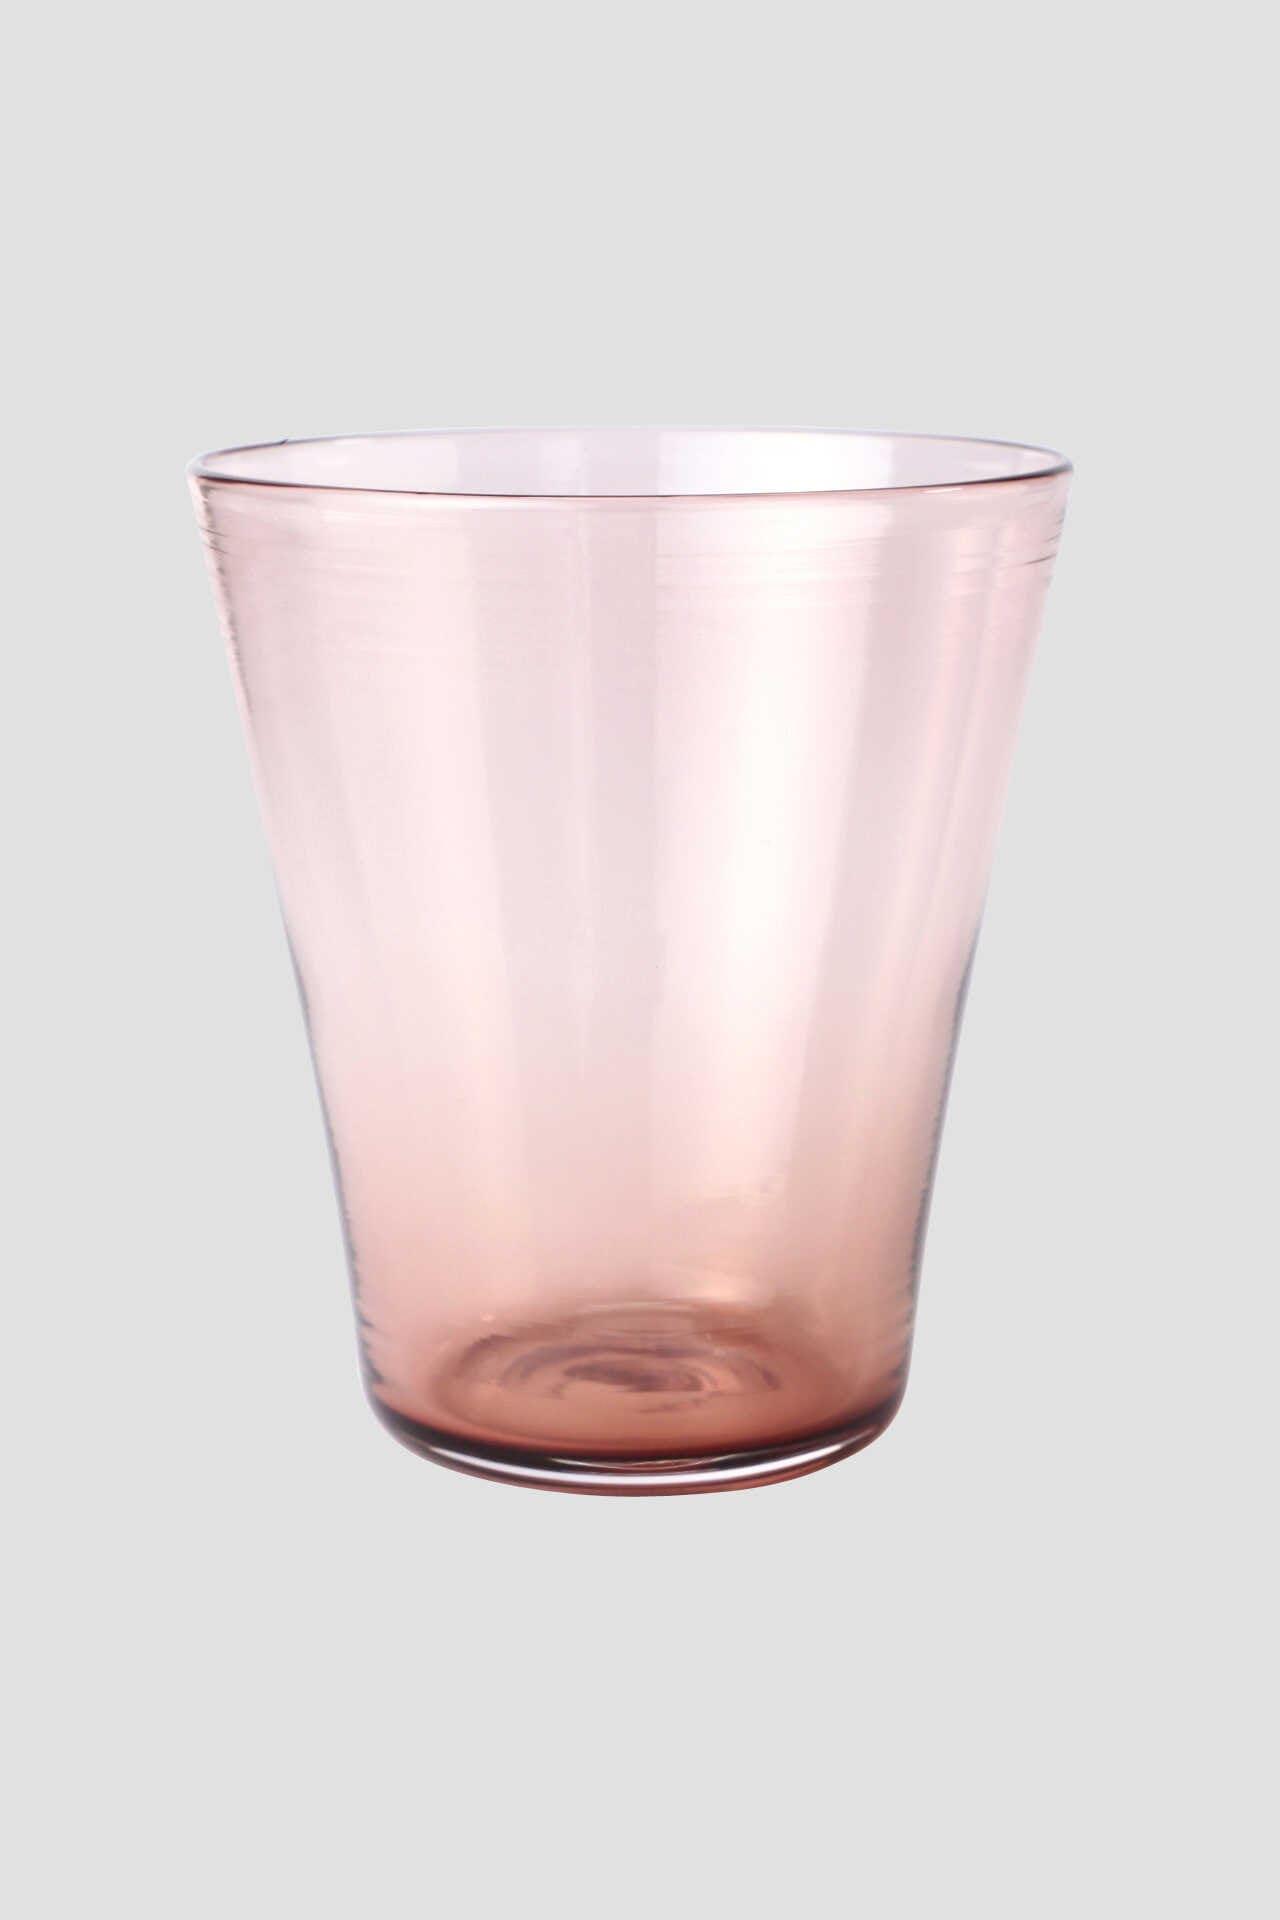 BLOWN GLASS WATER TUMBLER2